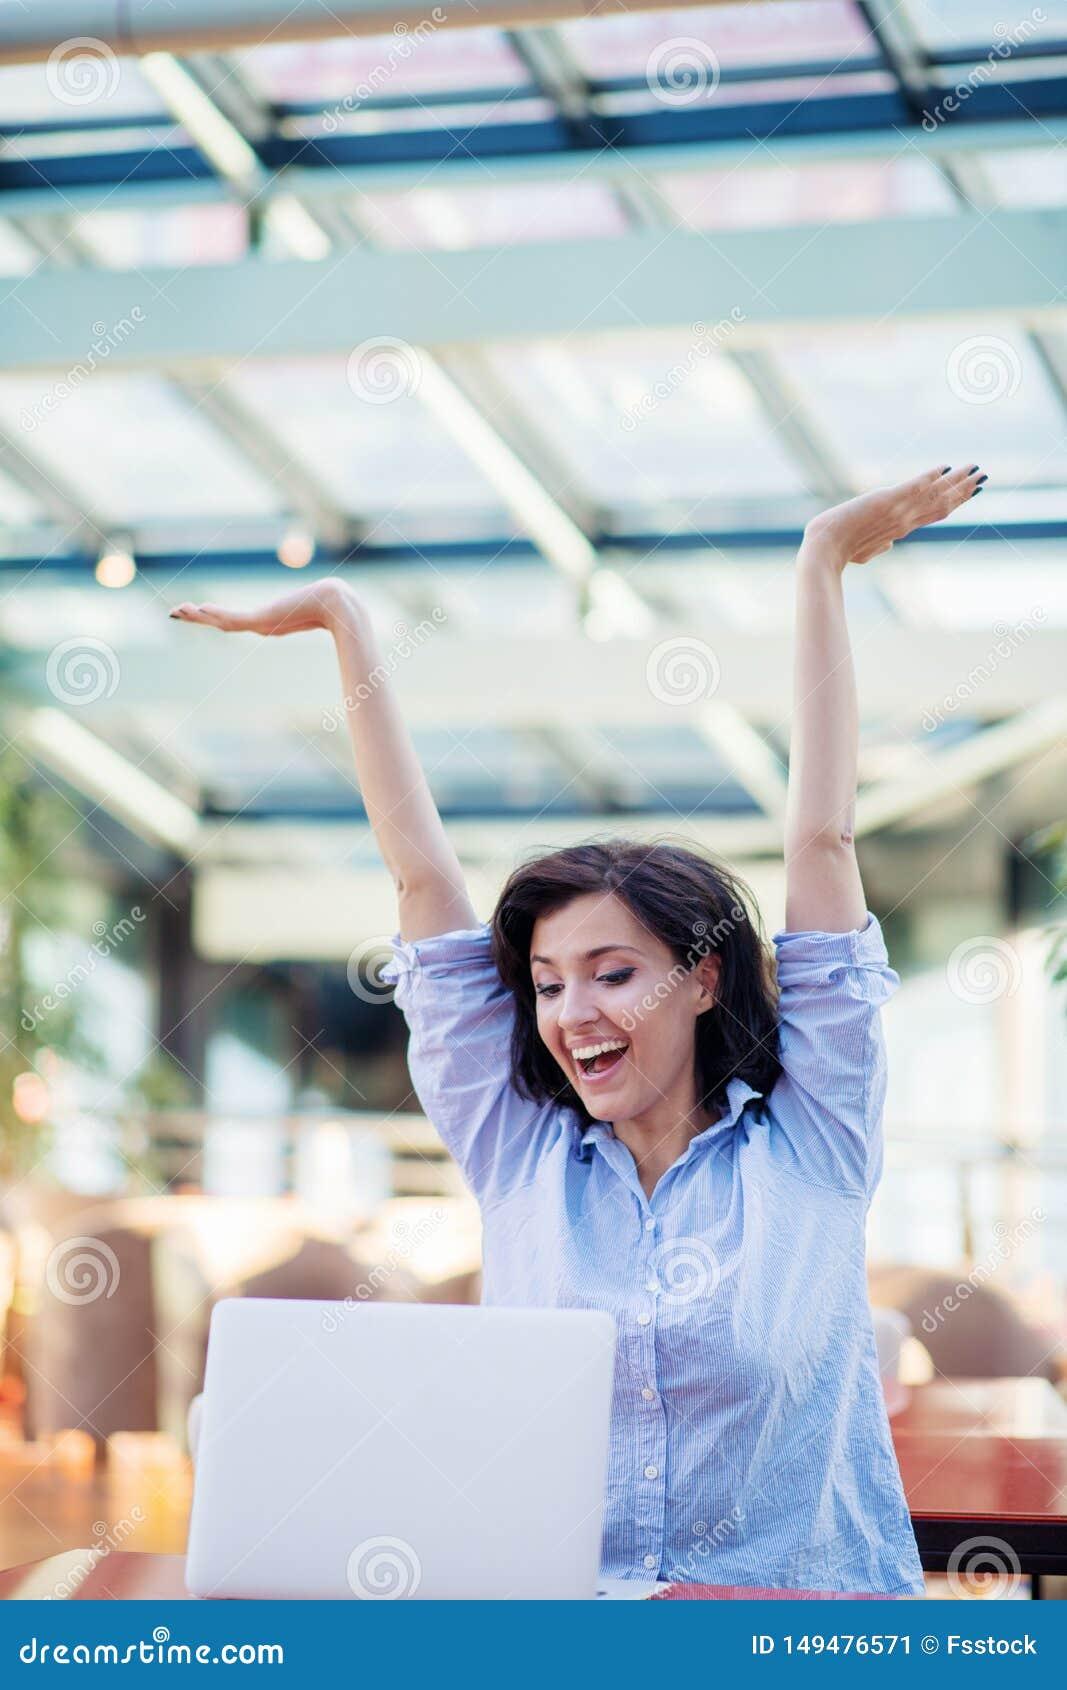 Opgewekte glimlachende vrouw die online winst vieren, die laptop in koffie met behulp van, bekijkend scherm, die met het opheffen